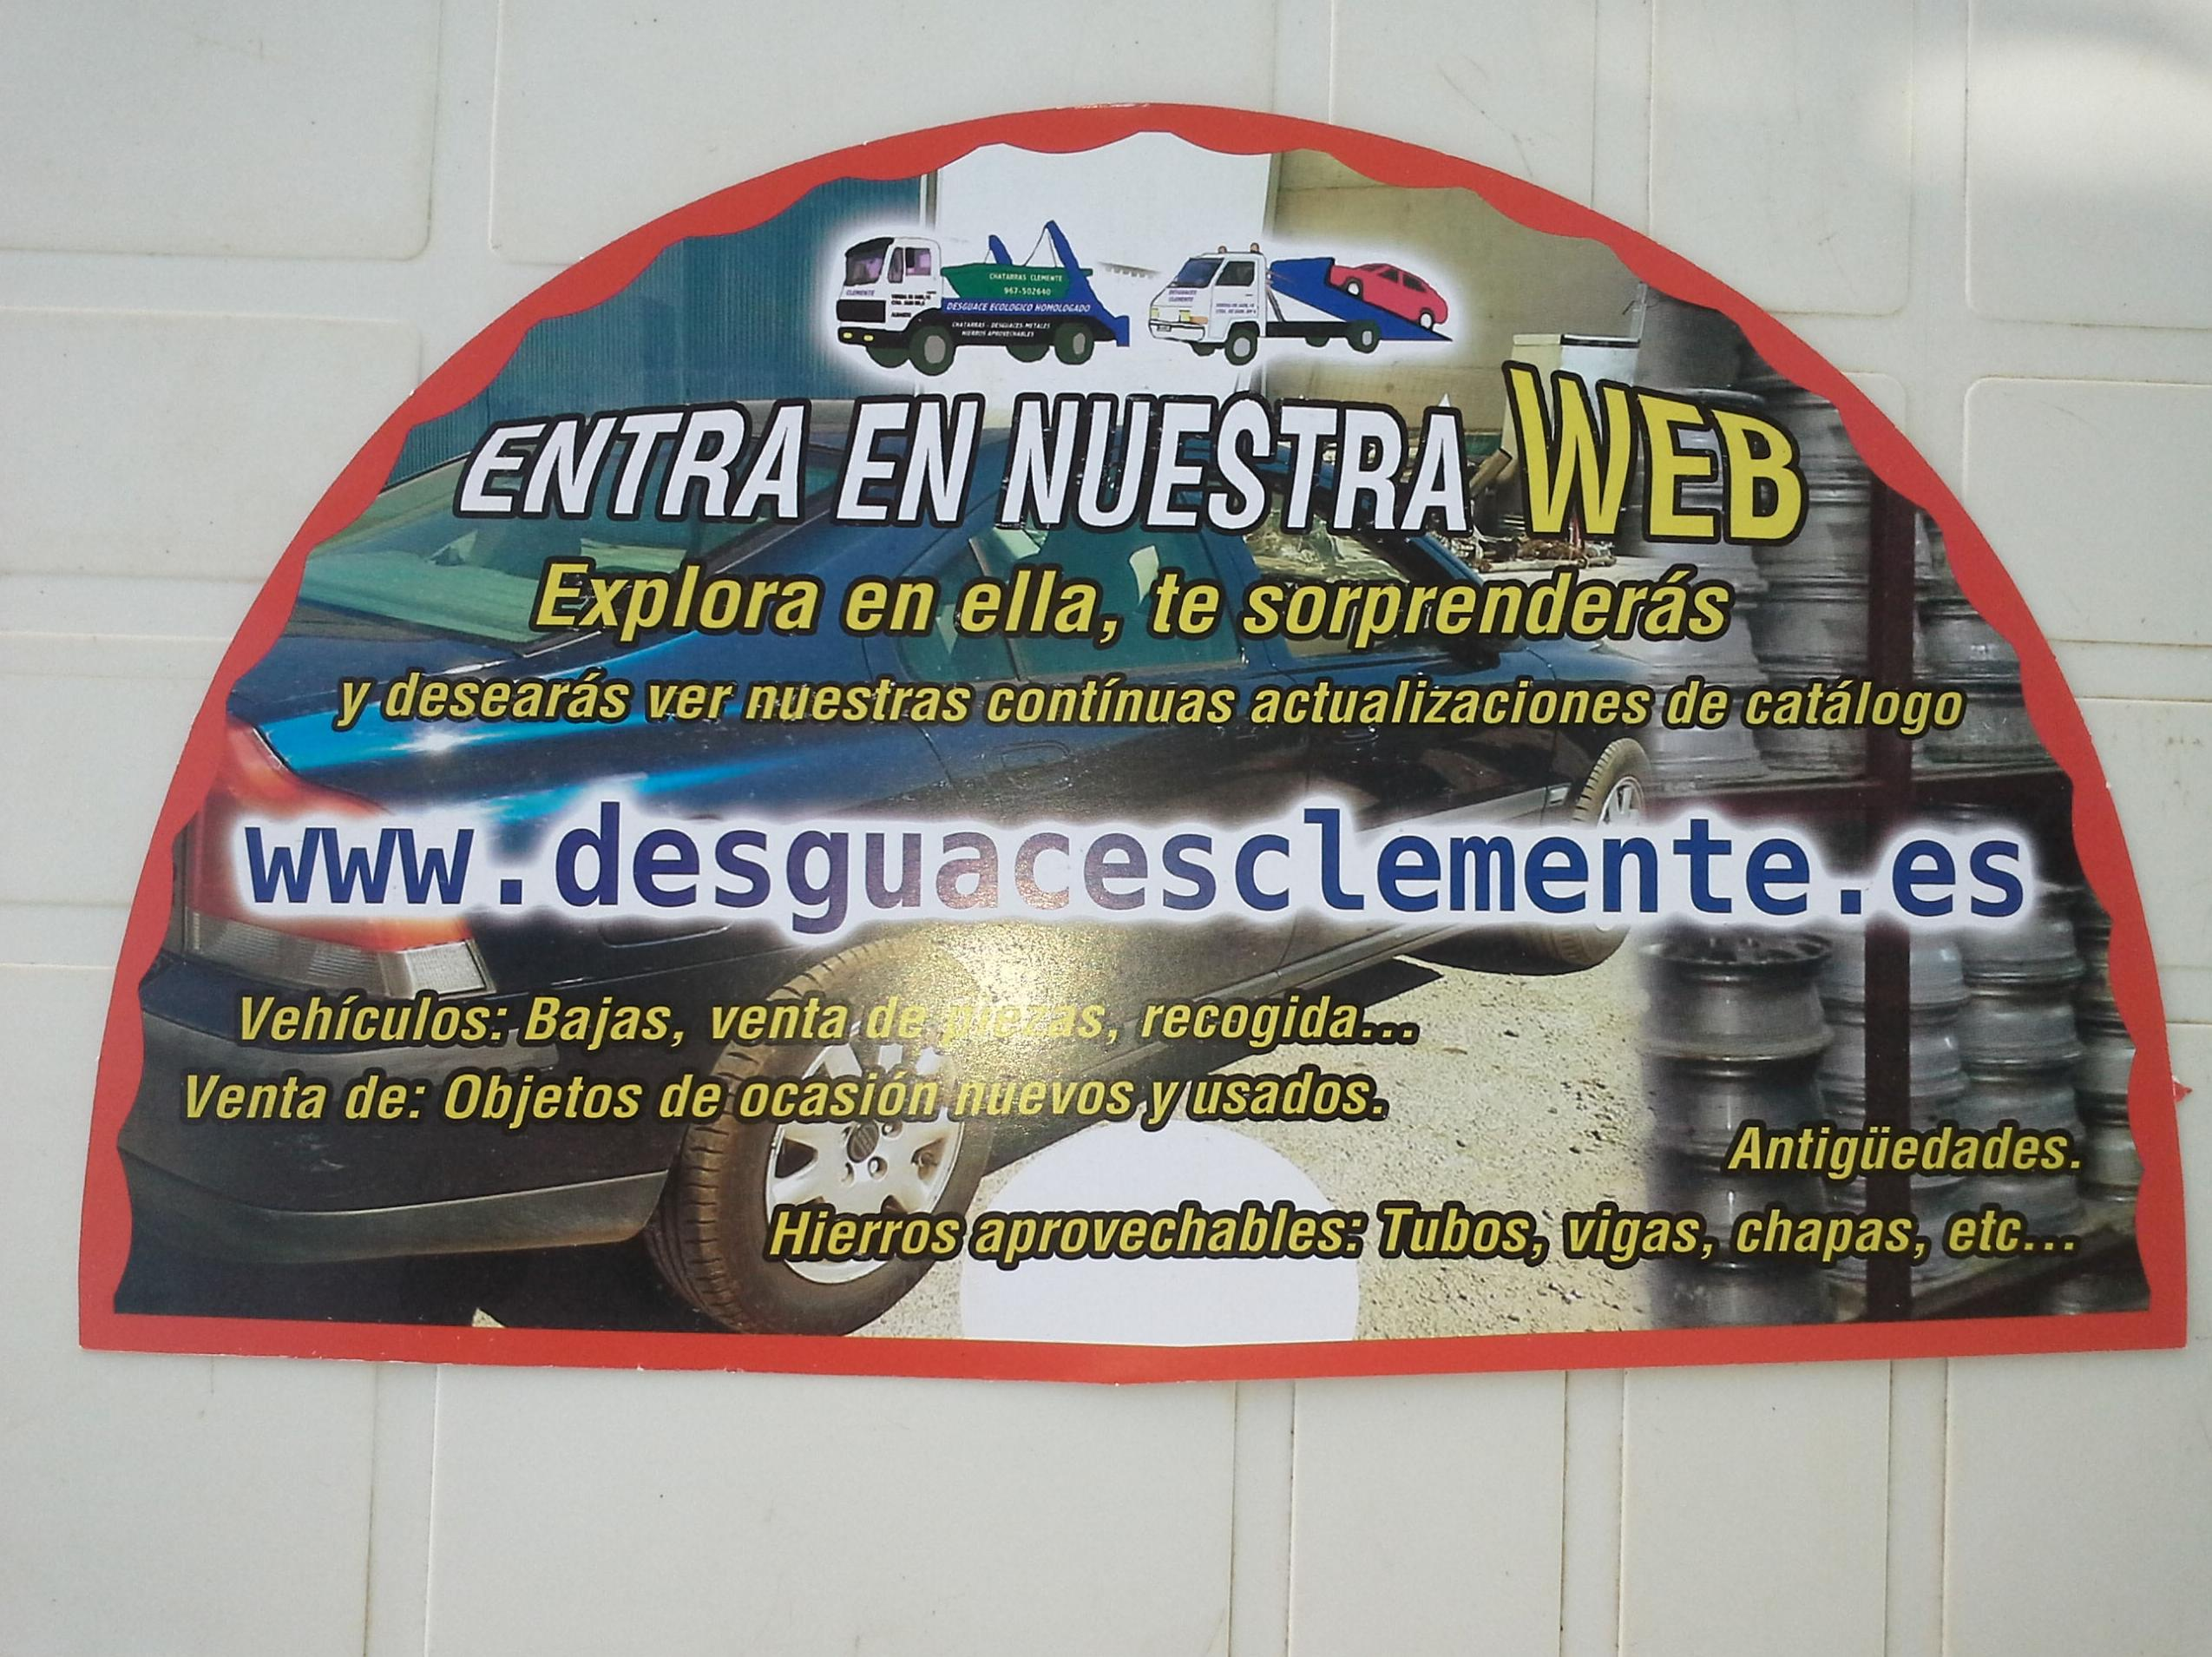 Abanicos de Desguaces Clemente entregados en la feria de Albacete 2014